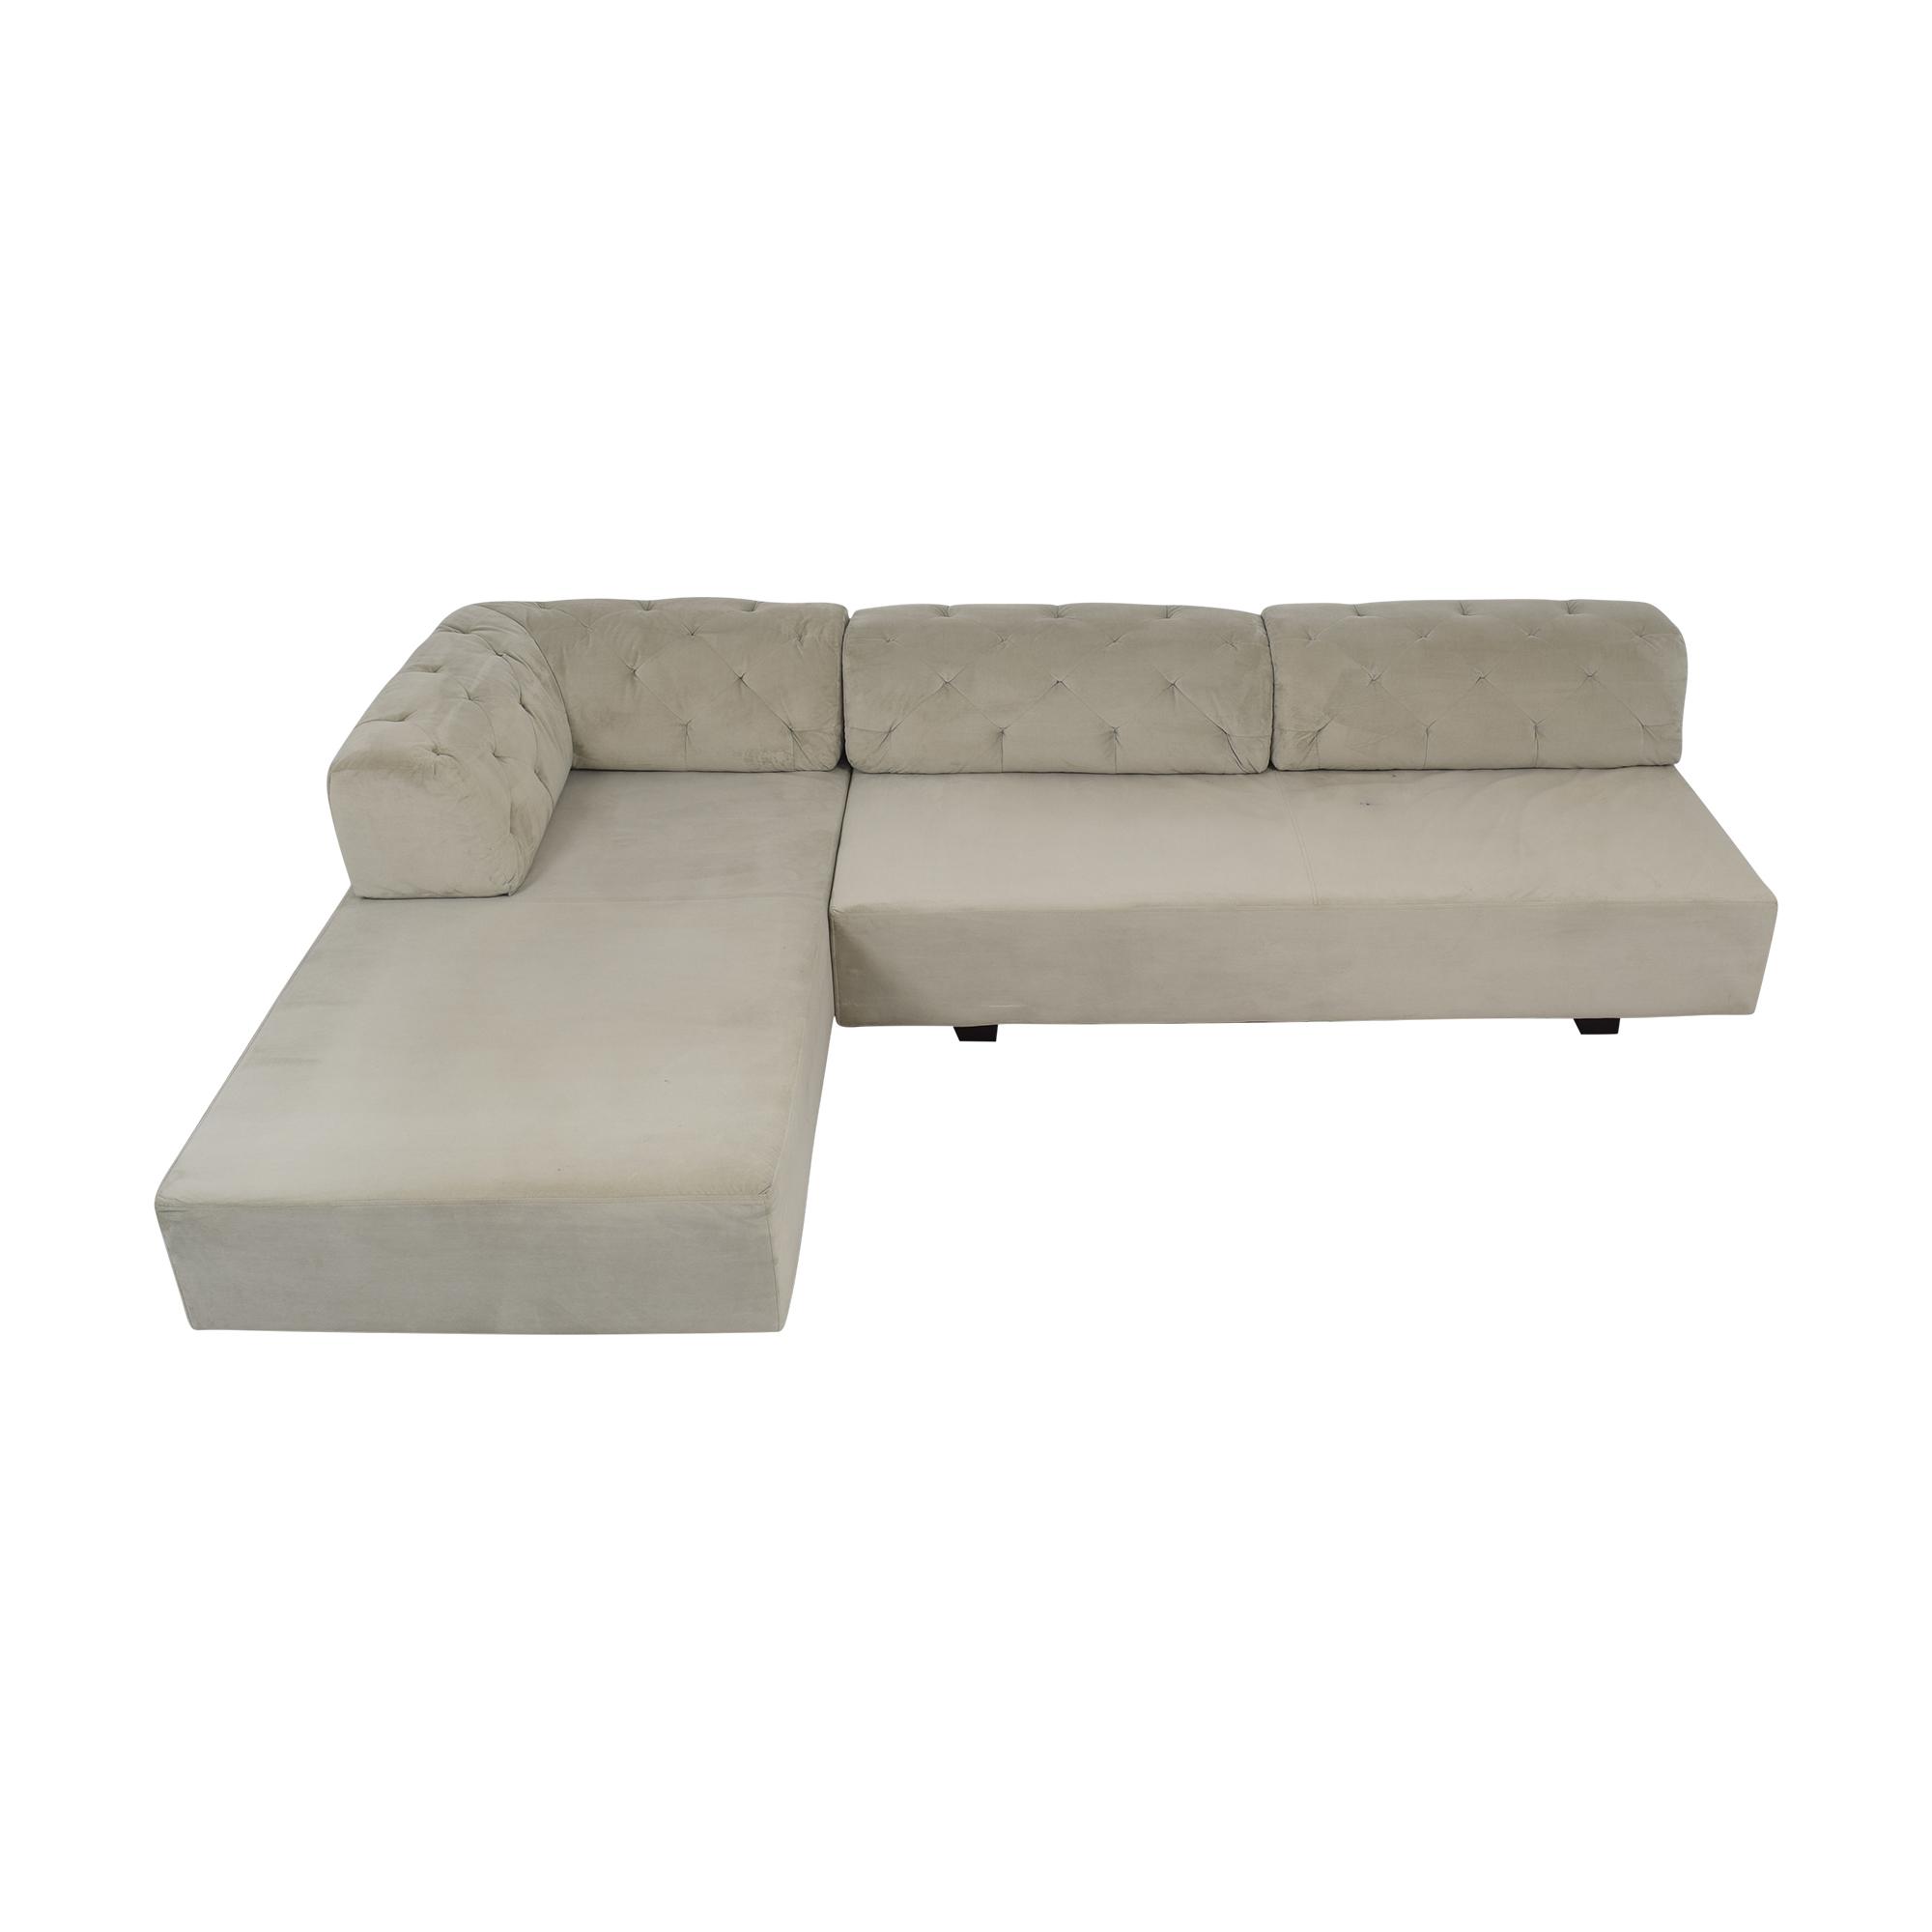 West Elm West Elm Tillary Tufted Sectional Sofa for sale